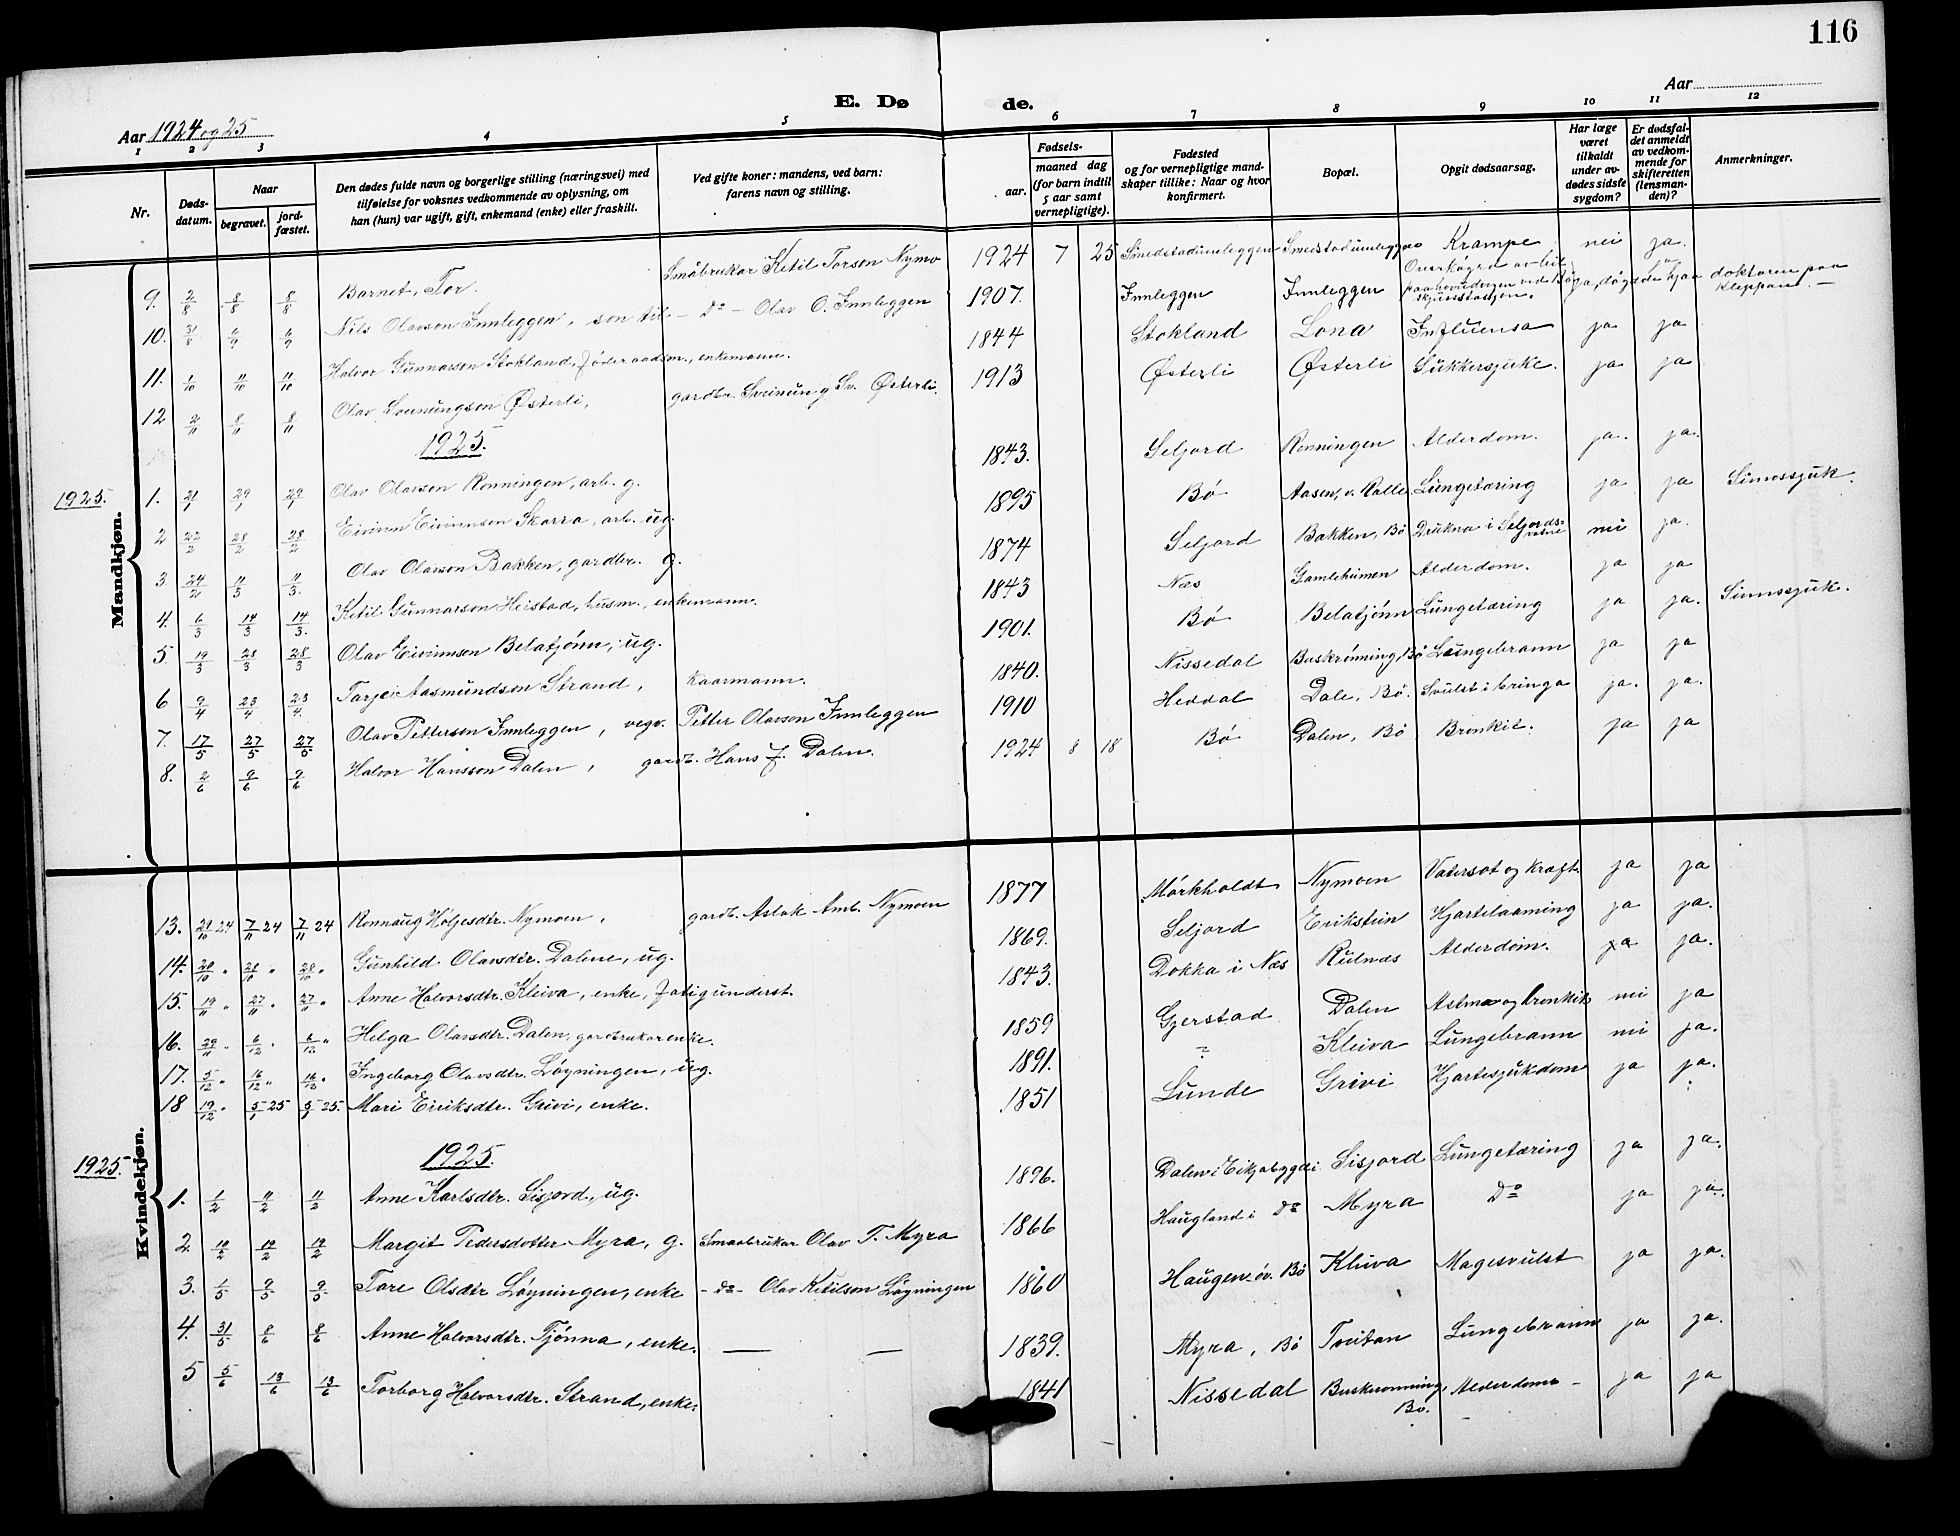 SAKO, Bø kirkebøker, G/Ga/L0008: Klokkerbok nr. 8, 1920-1930, s. 116